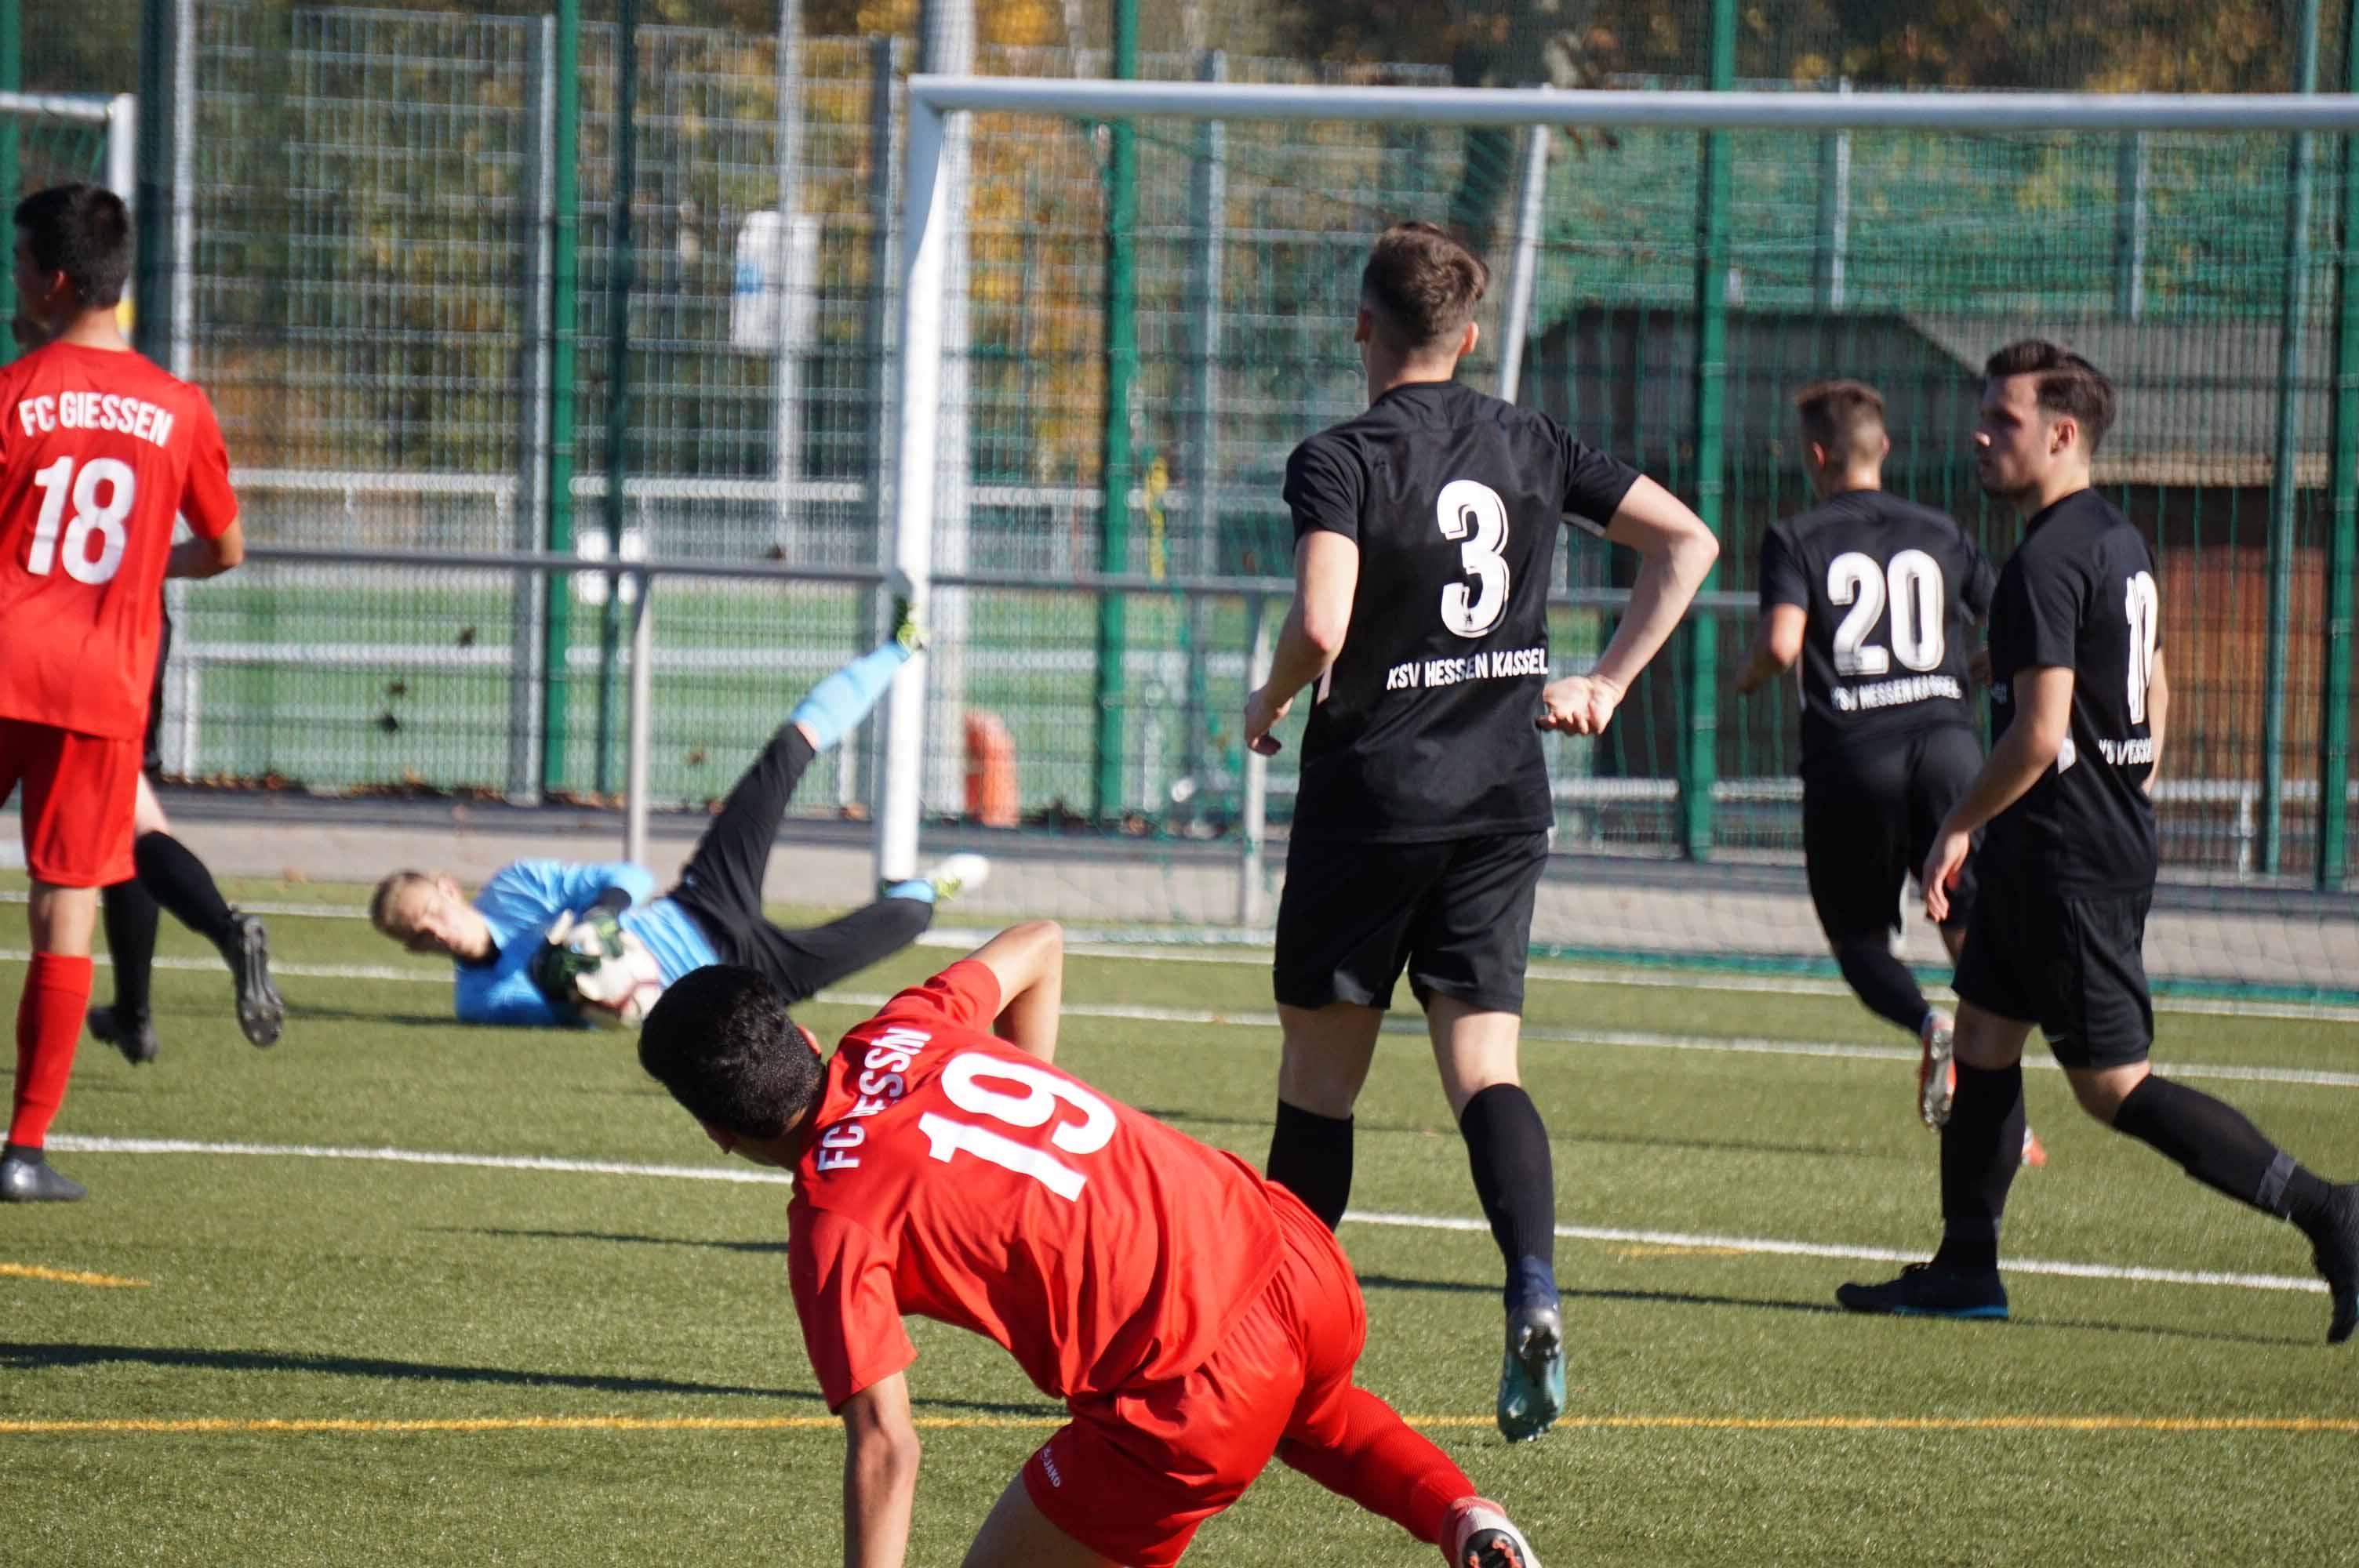 U19 - FC Giessen